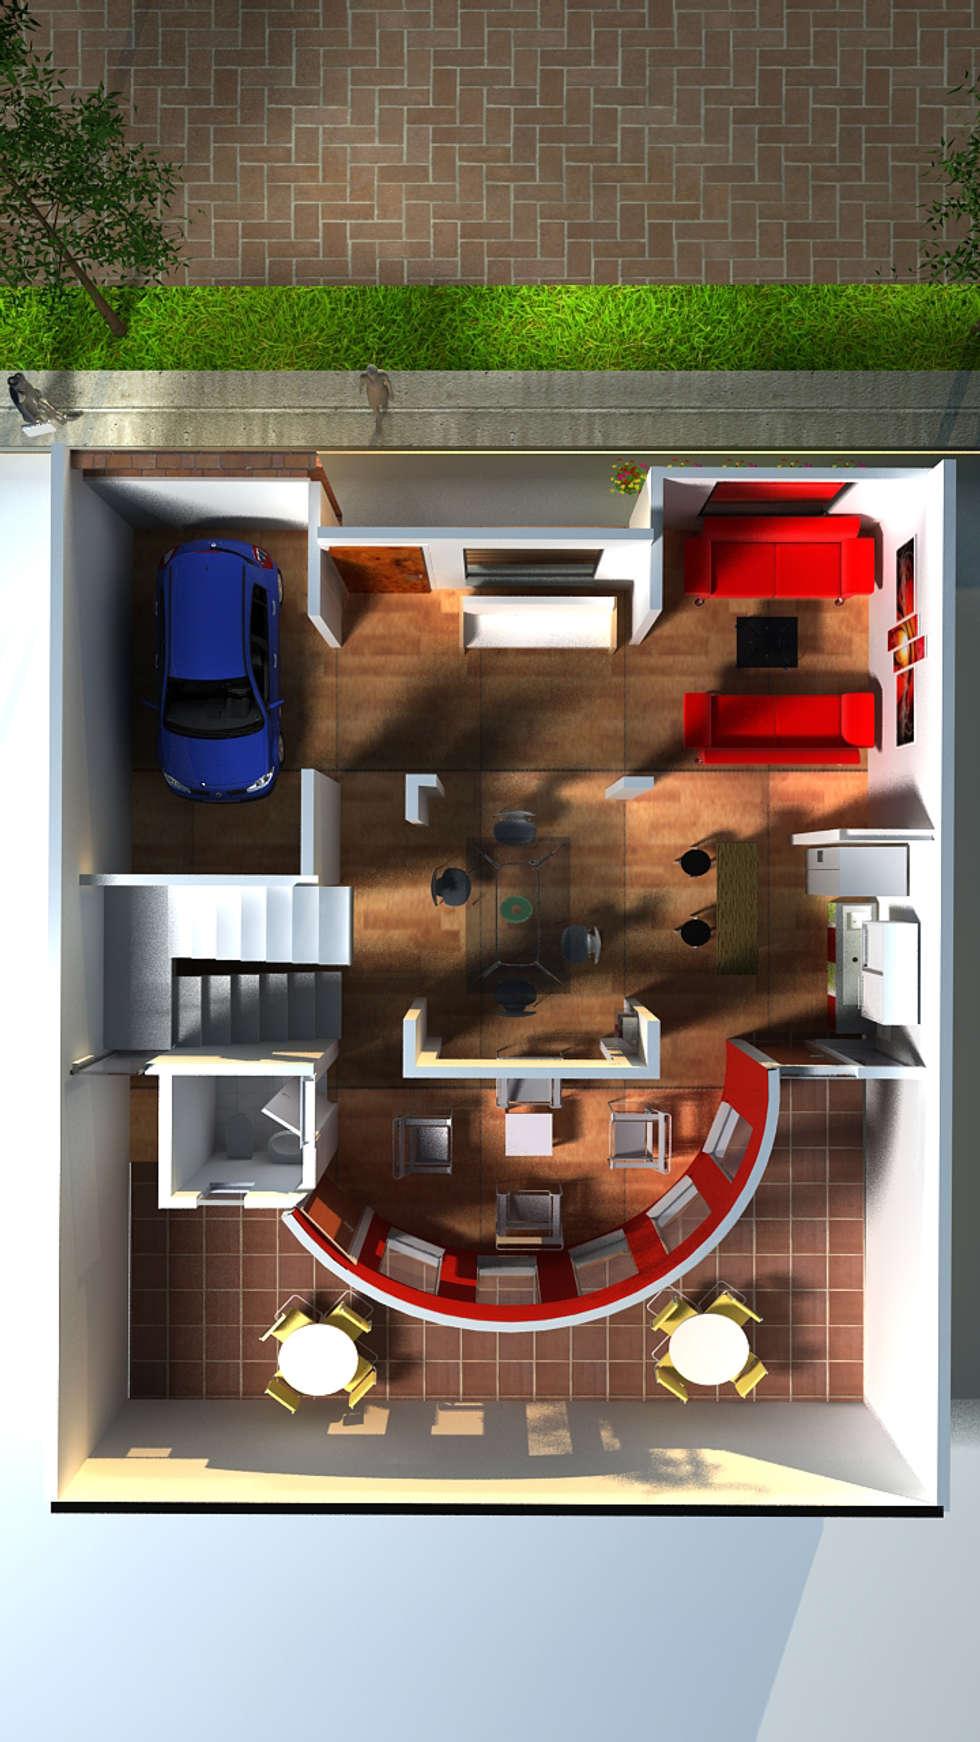 Urbanización San Miguel, Casa Medianera : Casas de estilo moderno por Santiago Zuluaga Arroyave